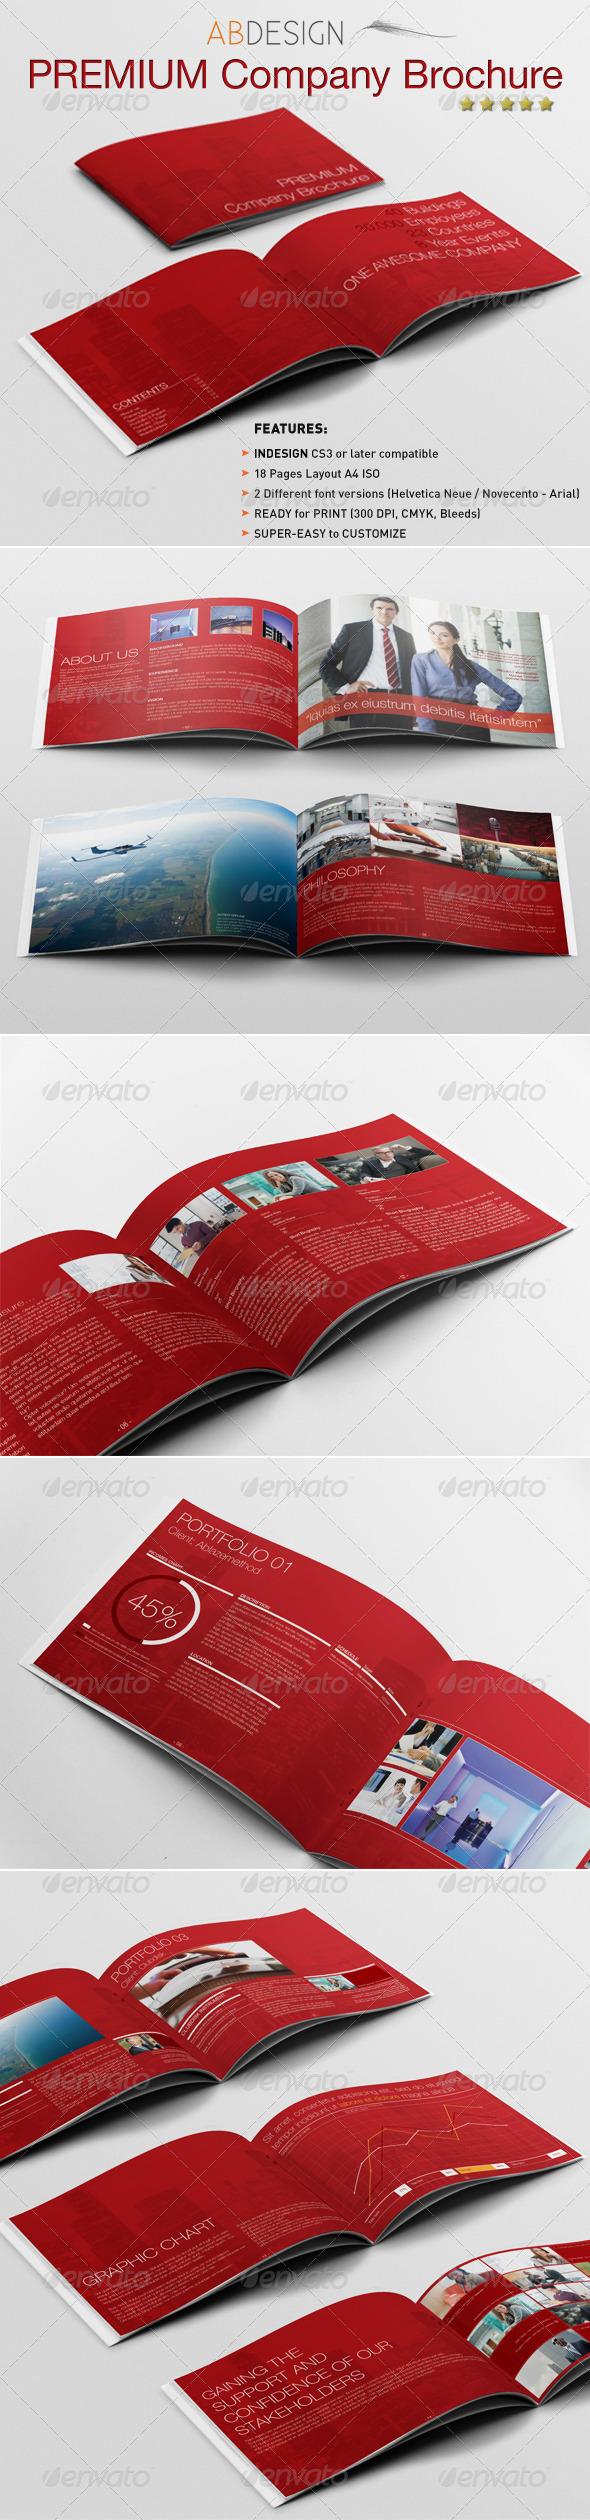 A4 Premium Corporate Brochure - Corporate Brochures